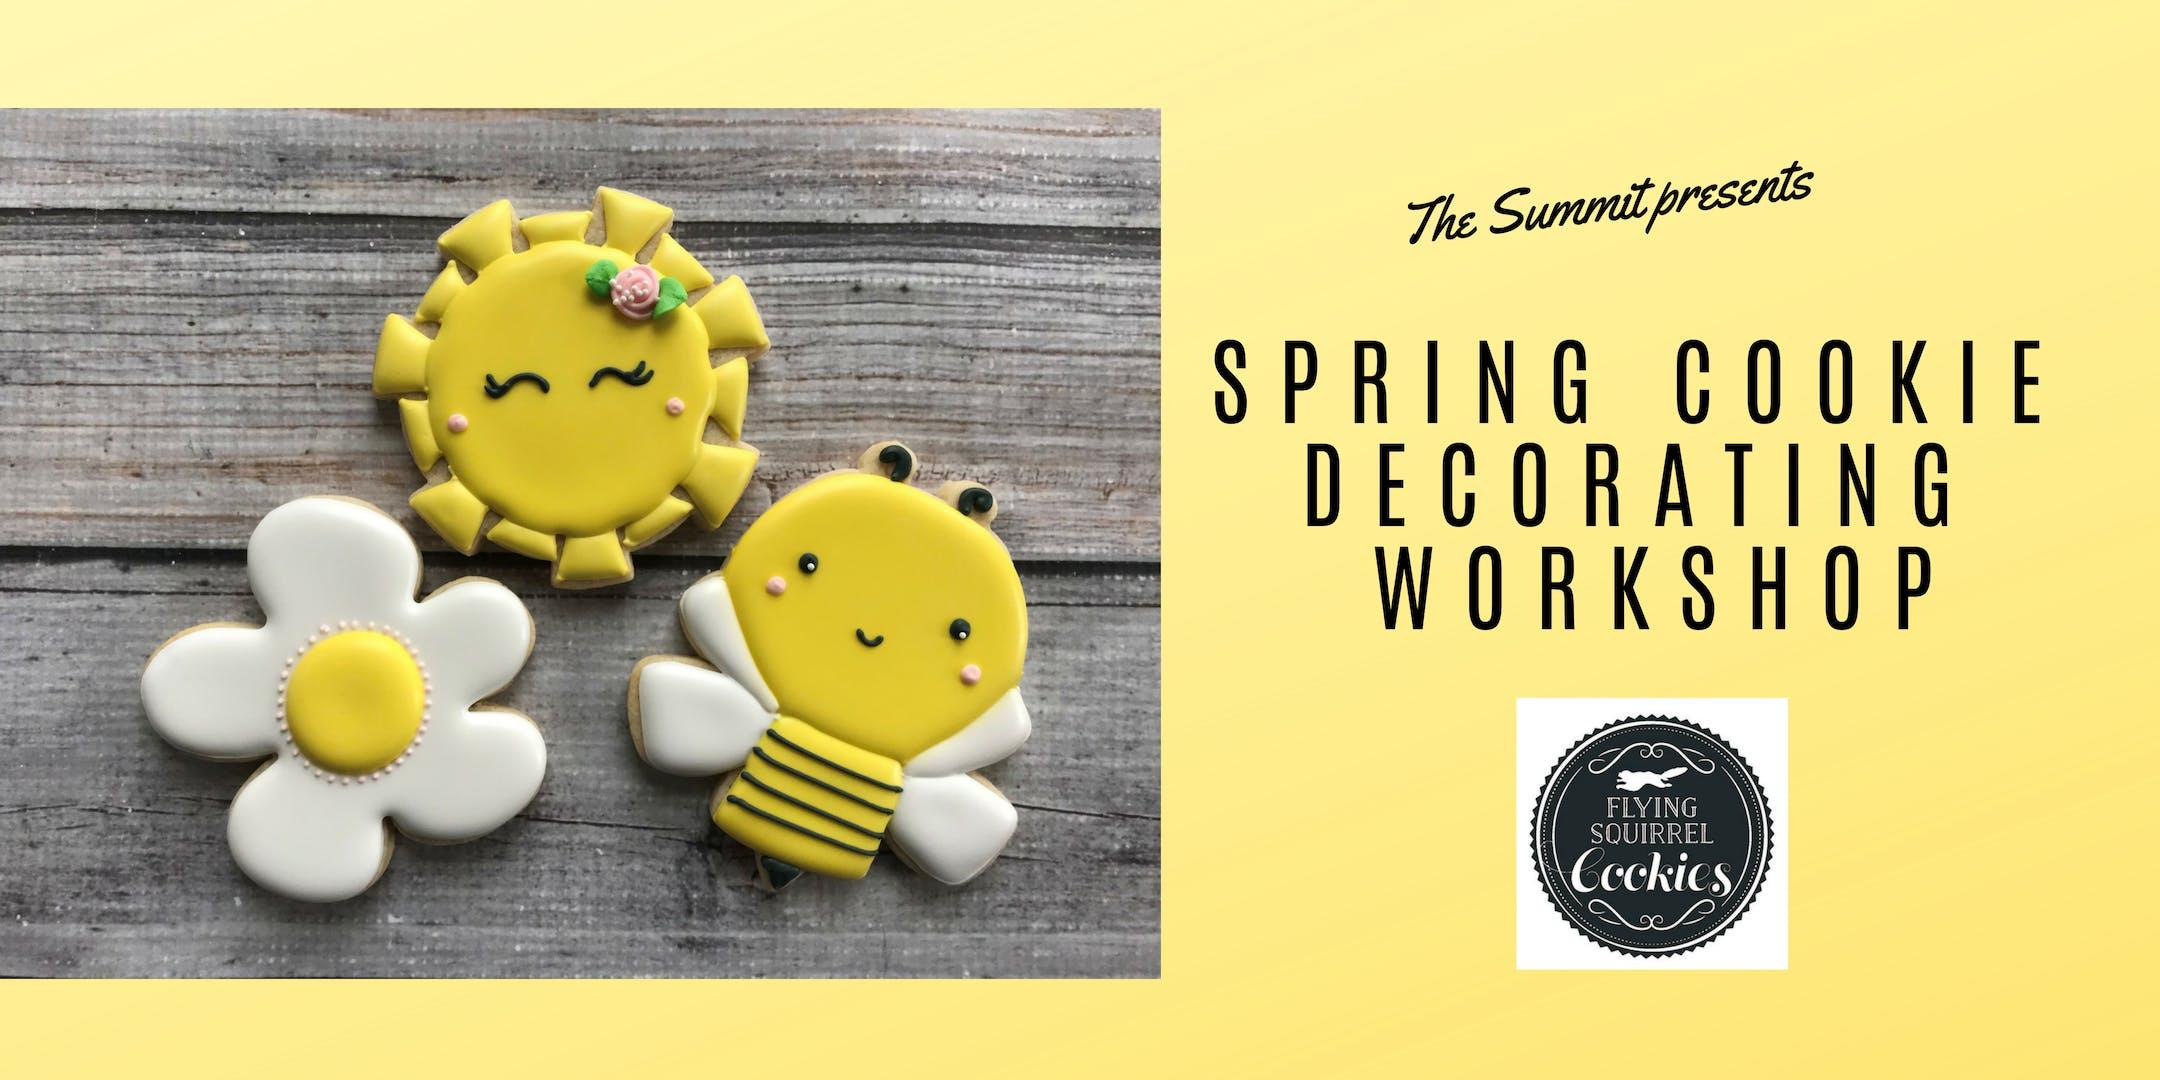 Spring Cookie Decorating Workshop - March 21